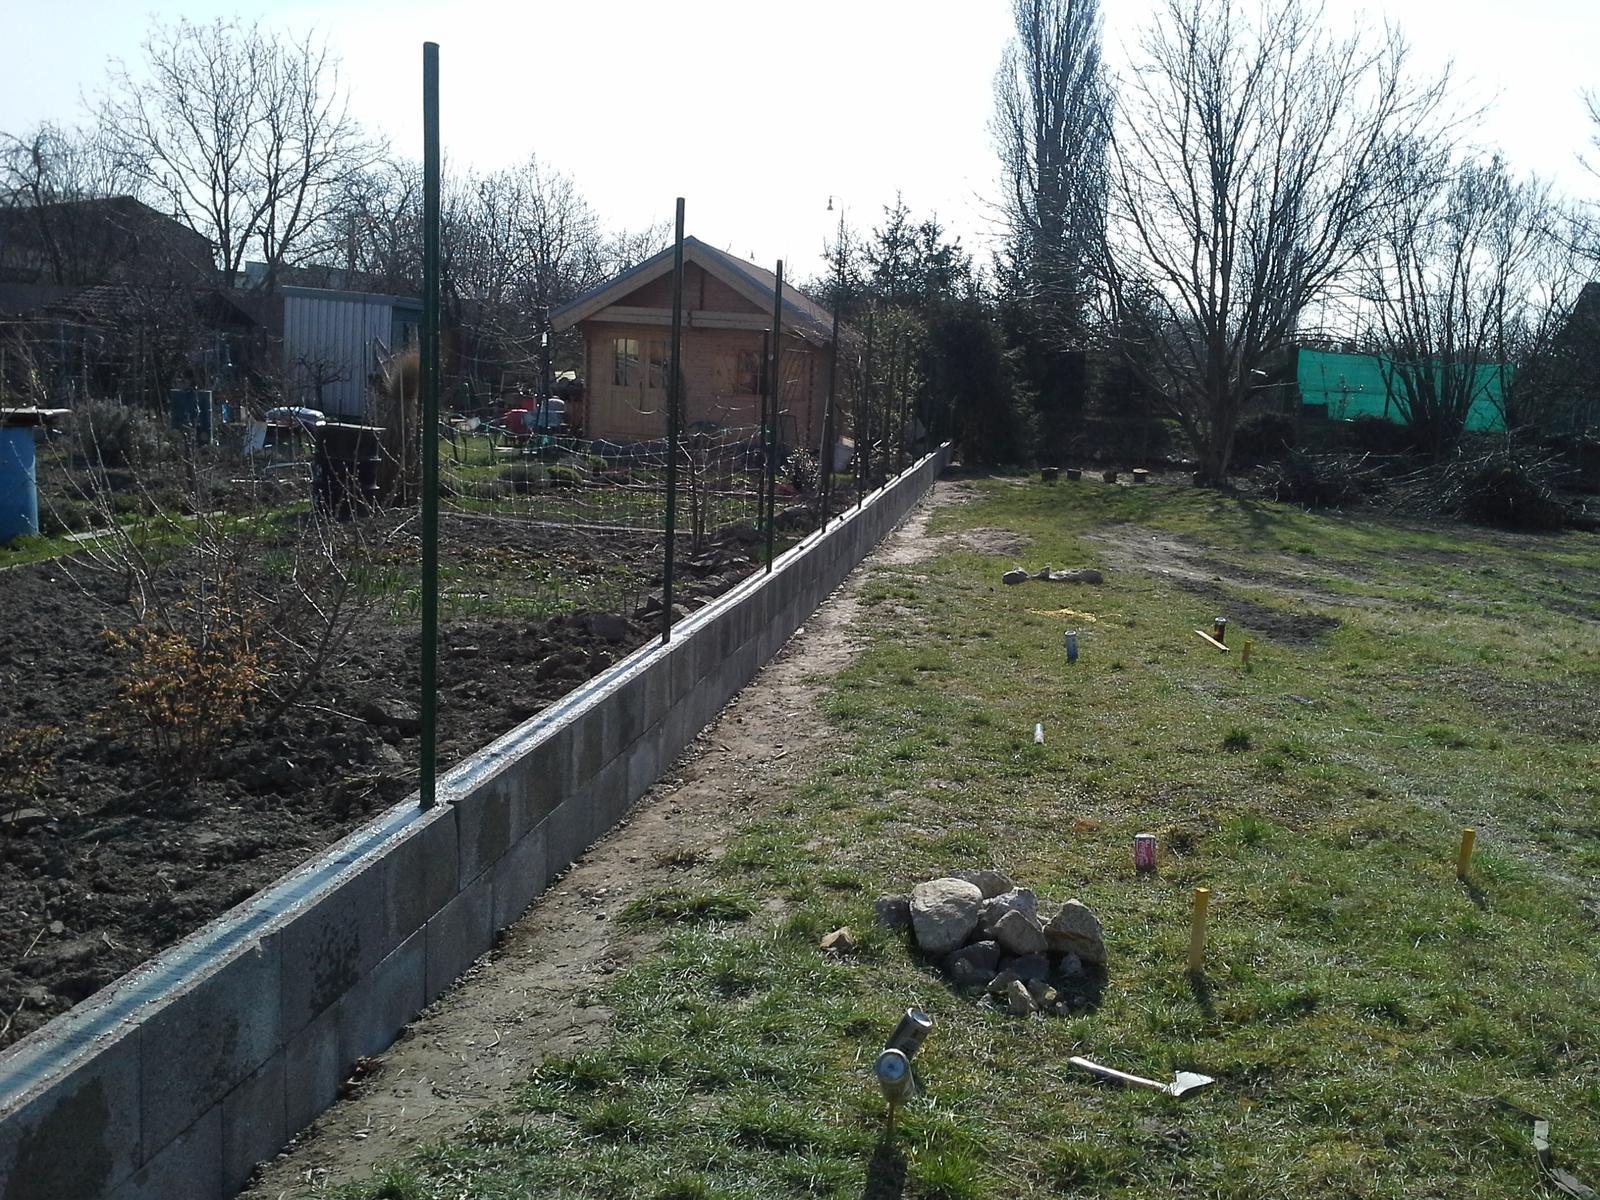 Nas zamocek - Klassik 148 prodom - Uz bude pomaly plot k susedom ...este pletivo a potom tujky